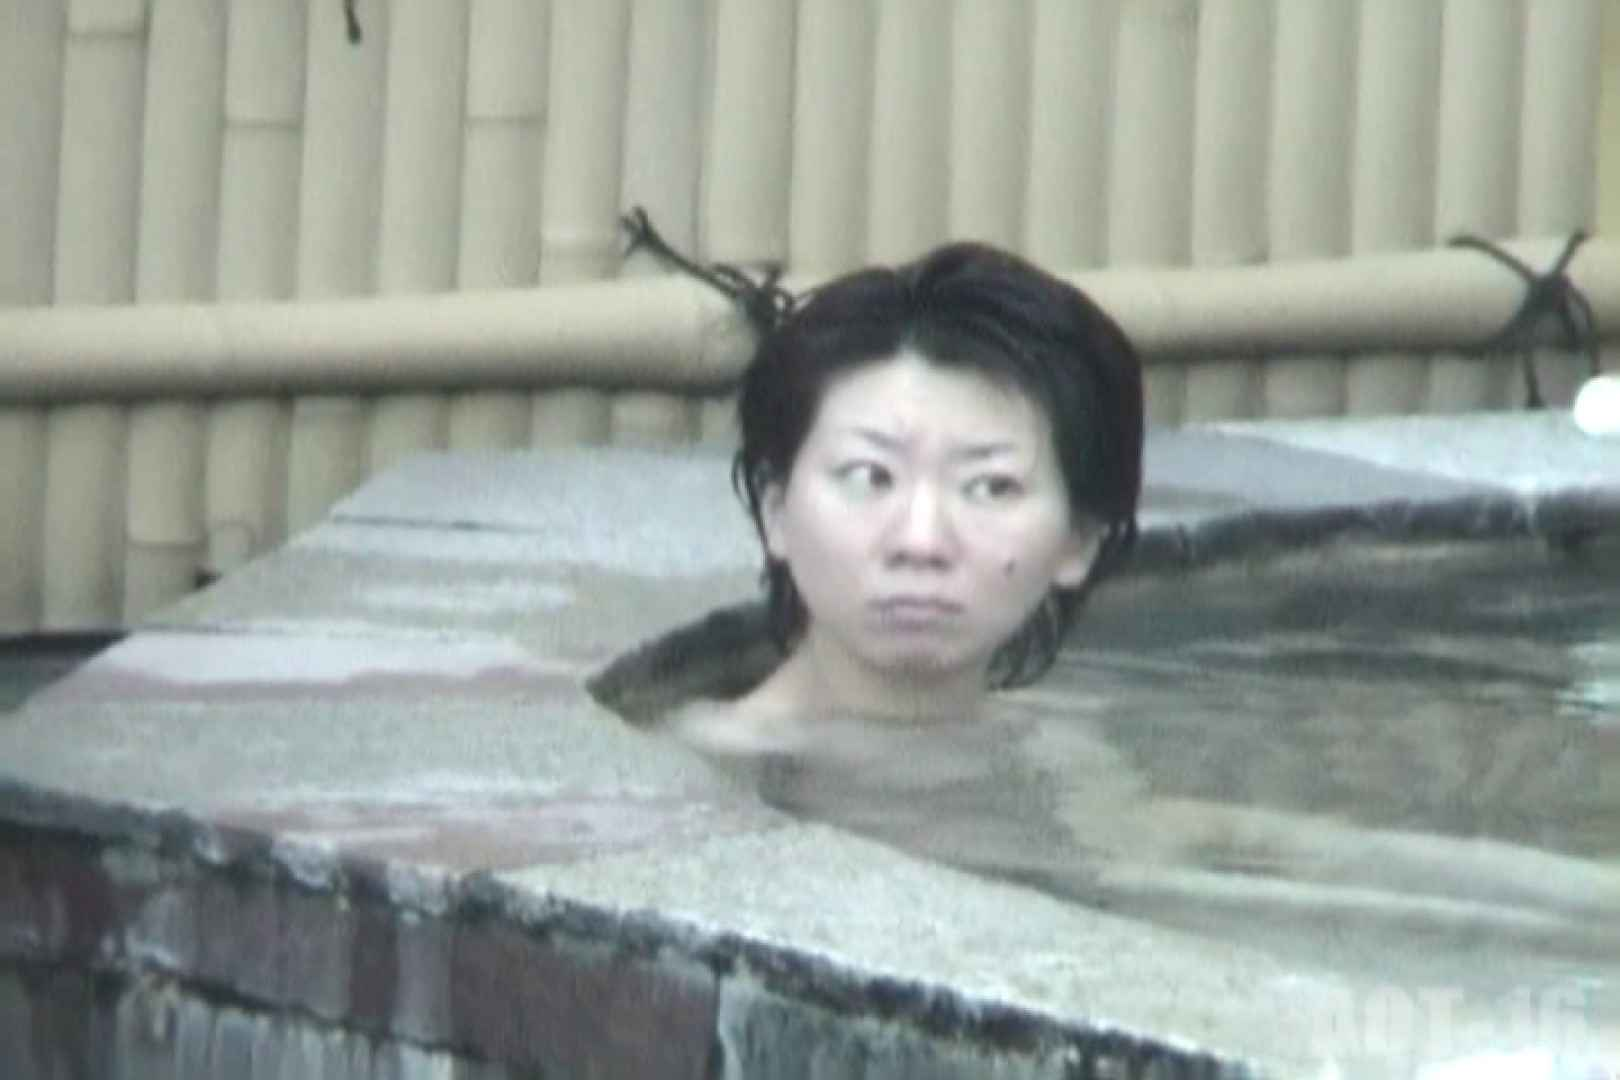 Aquaな露天風呂Vol.842 露天風呂編 | 盗撮シリーズ  82PIX 5